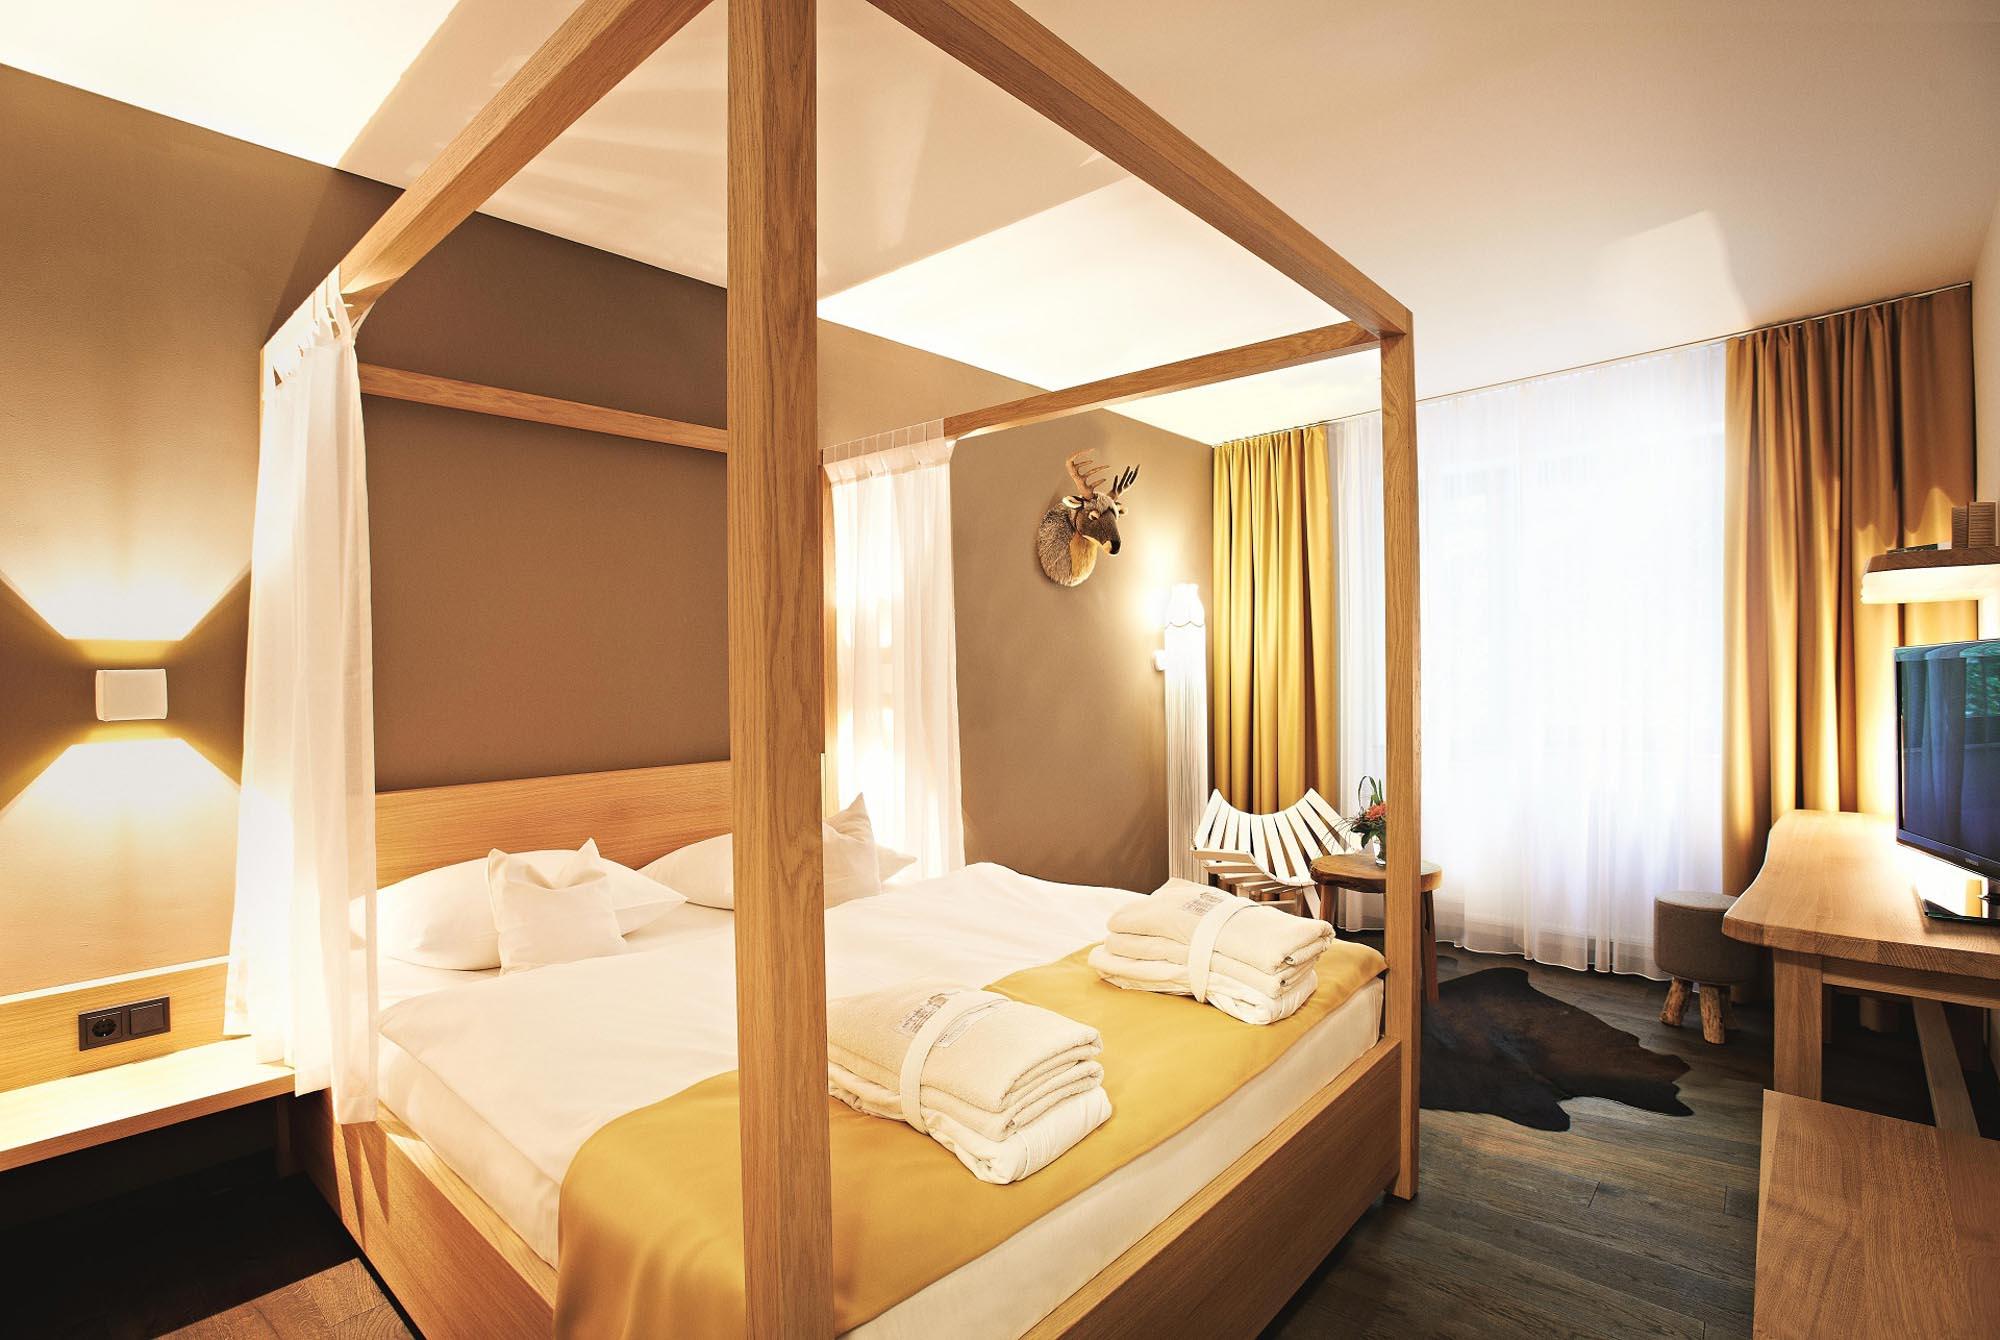 meble_hotelowe-2